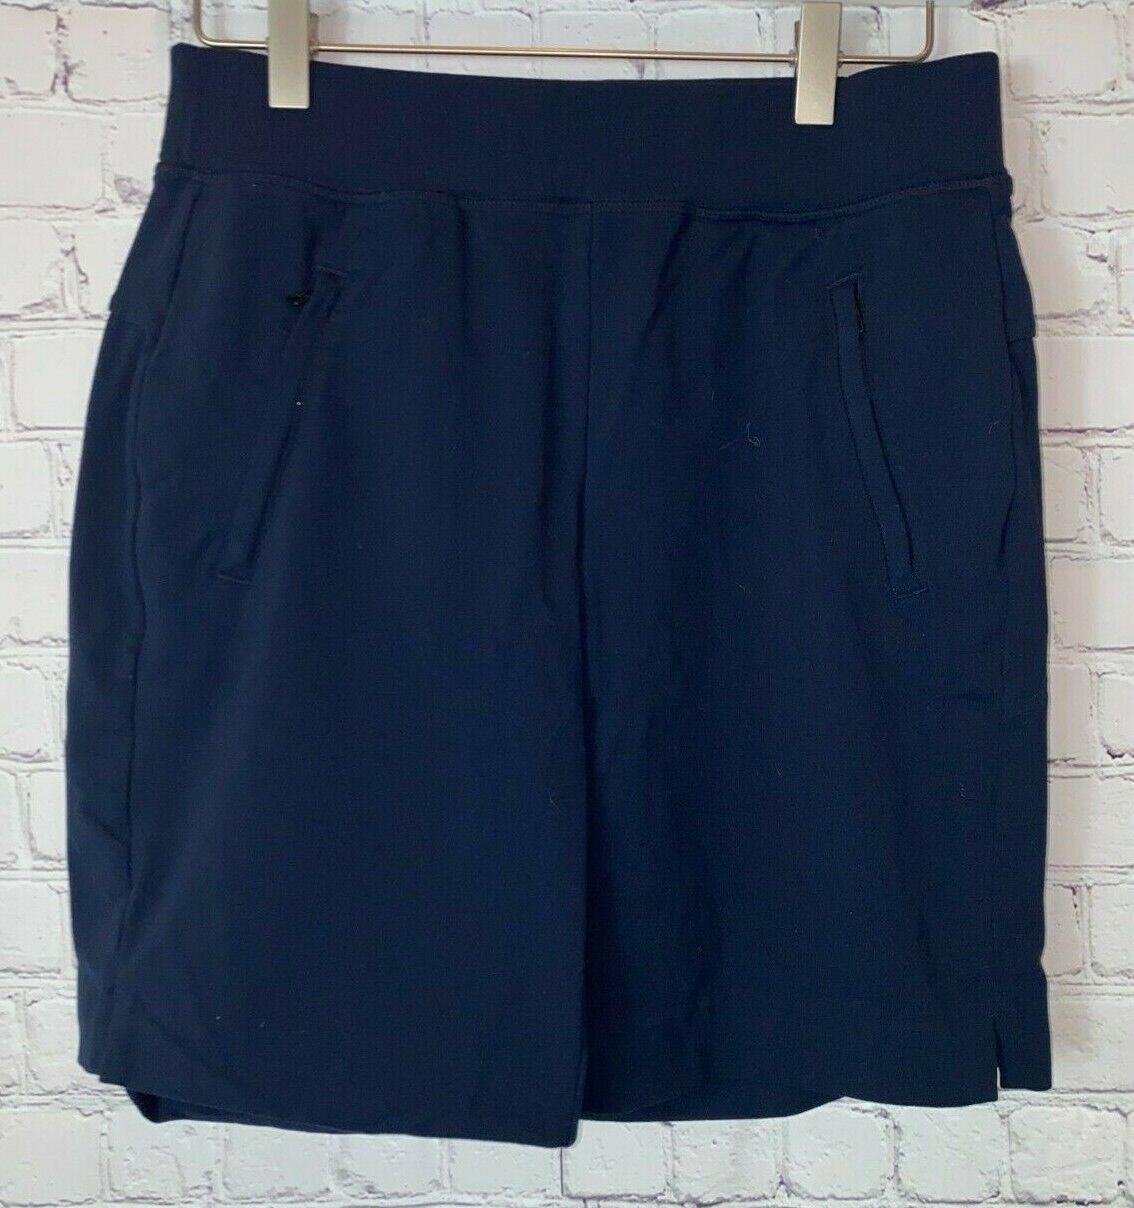 ATHLETA Womens' Navy Blue Athletic Shorts Size XS